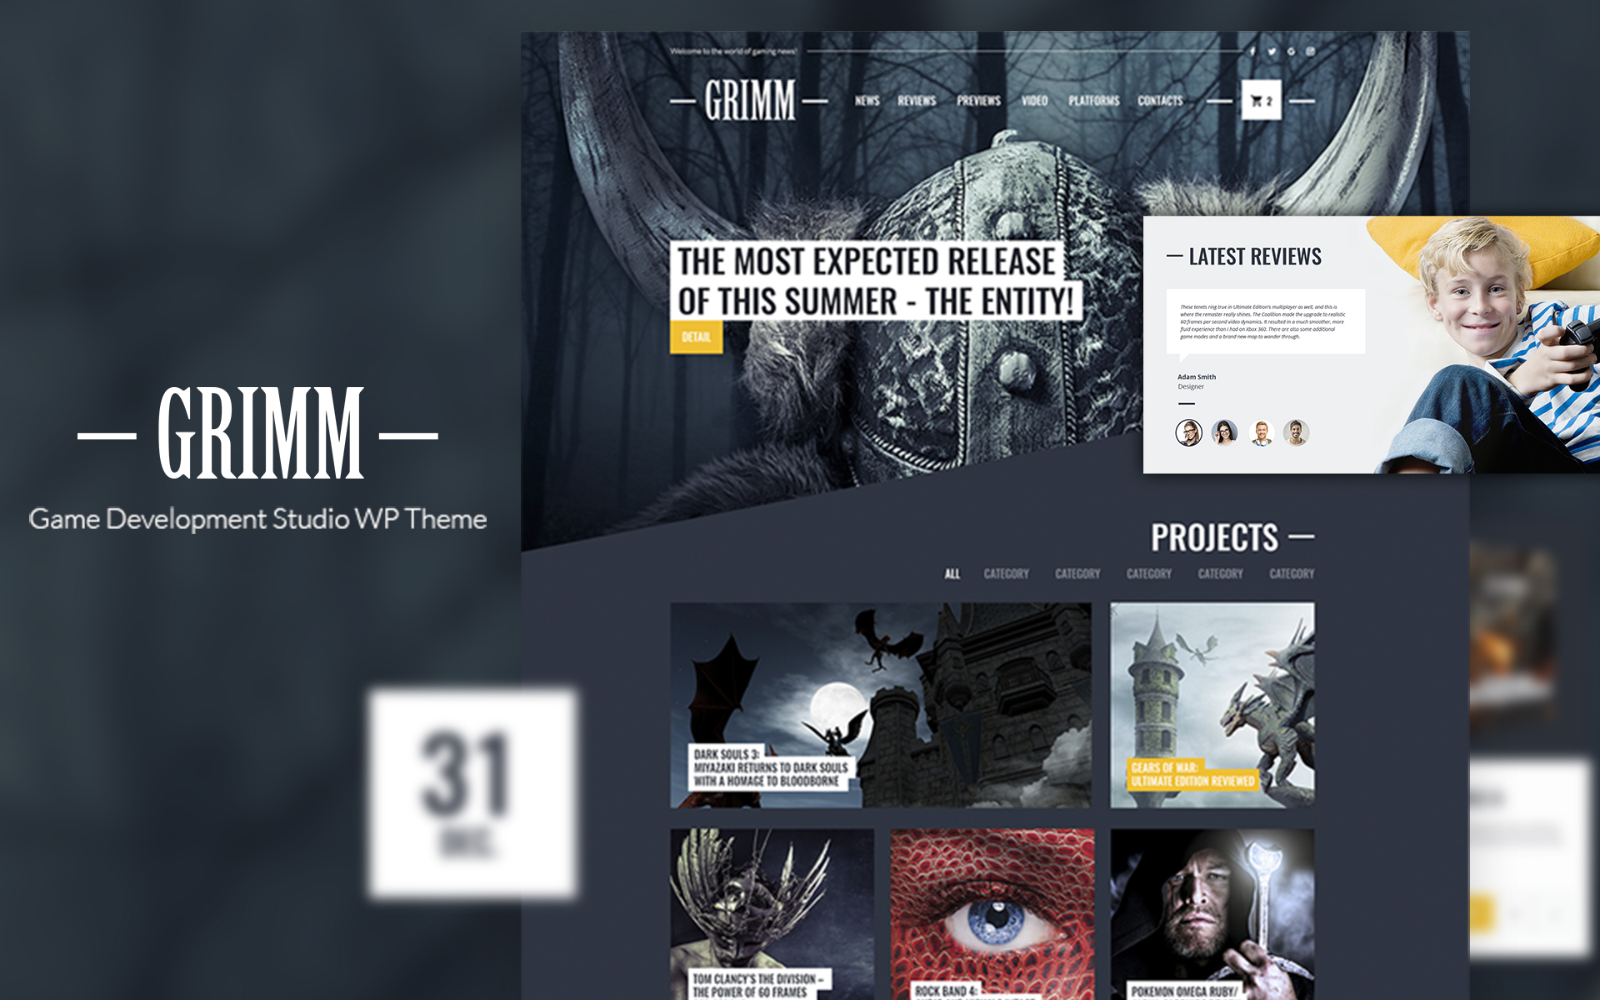 GRIMM lite - Game Development Studio WordPress Theme - screenshot